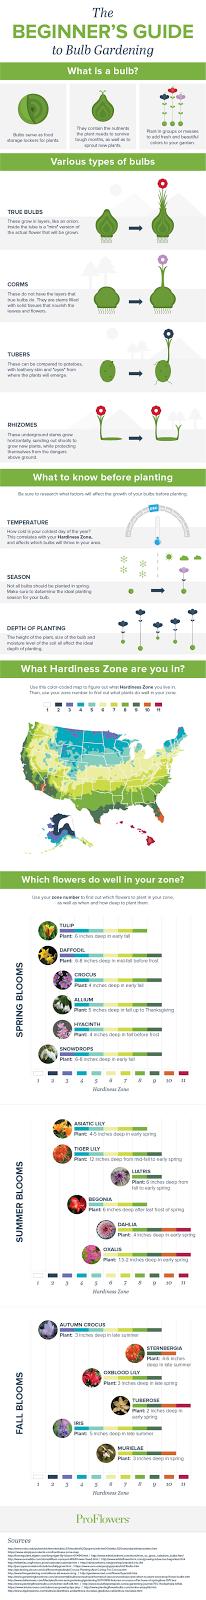 ://www.proflowers.com/blog/beginners-guide-bulb-gardening